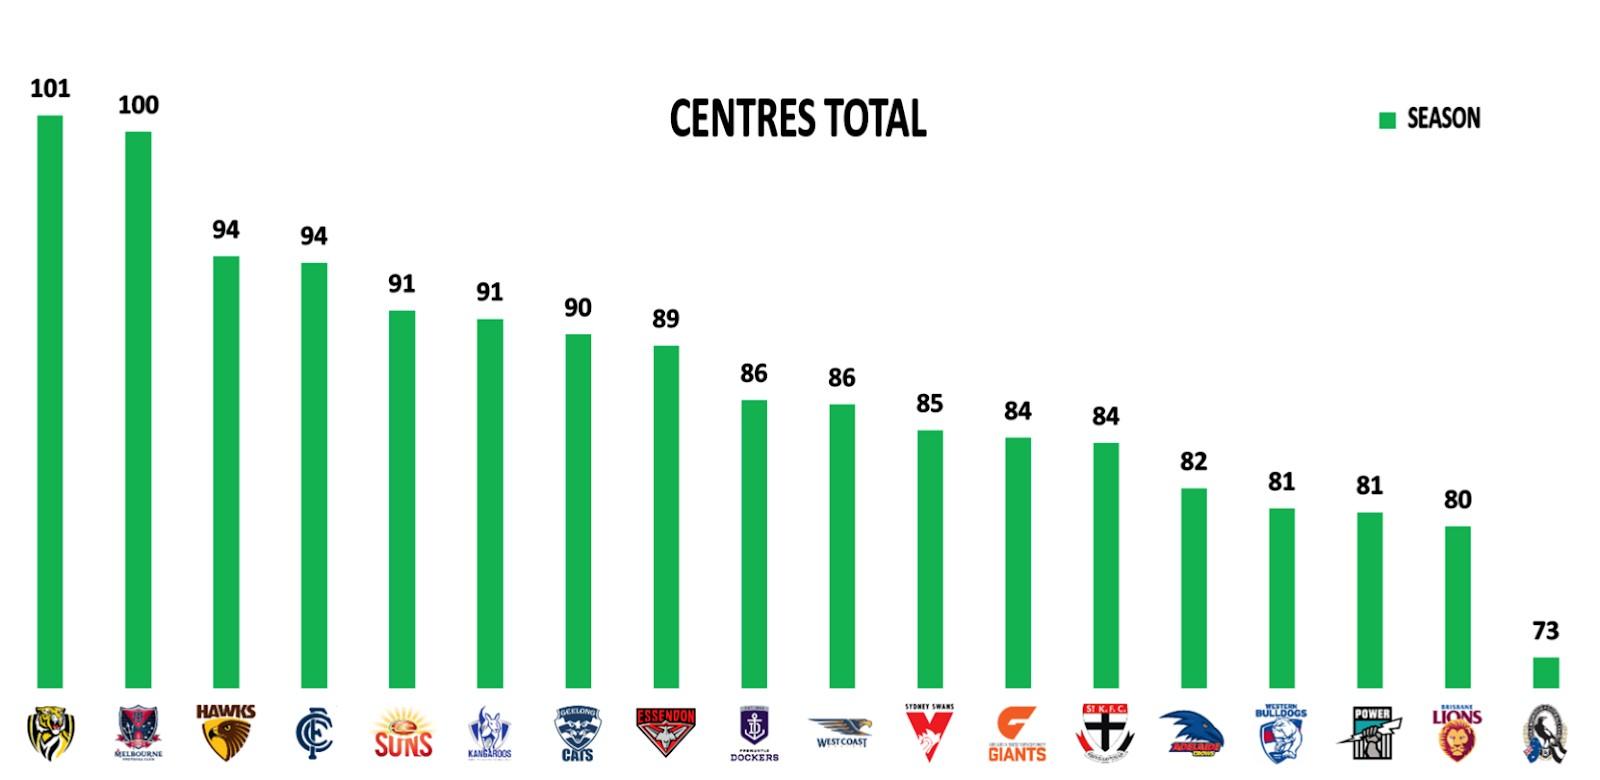 Points Against - Centres